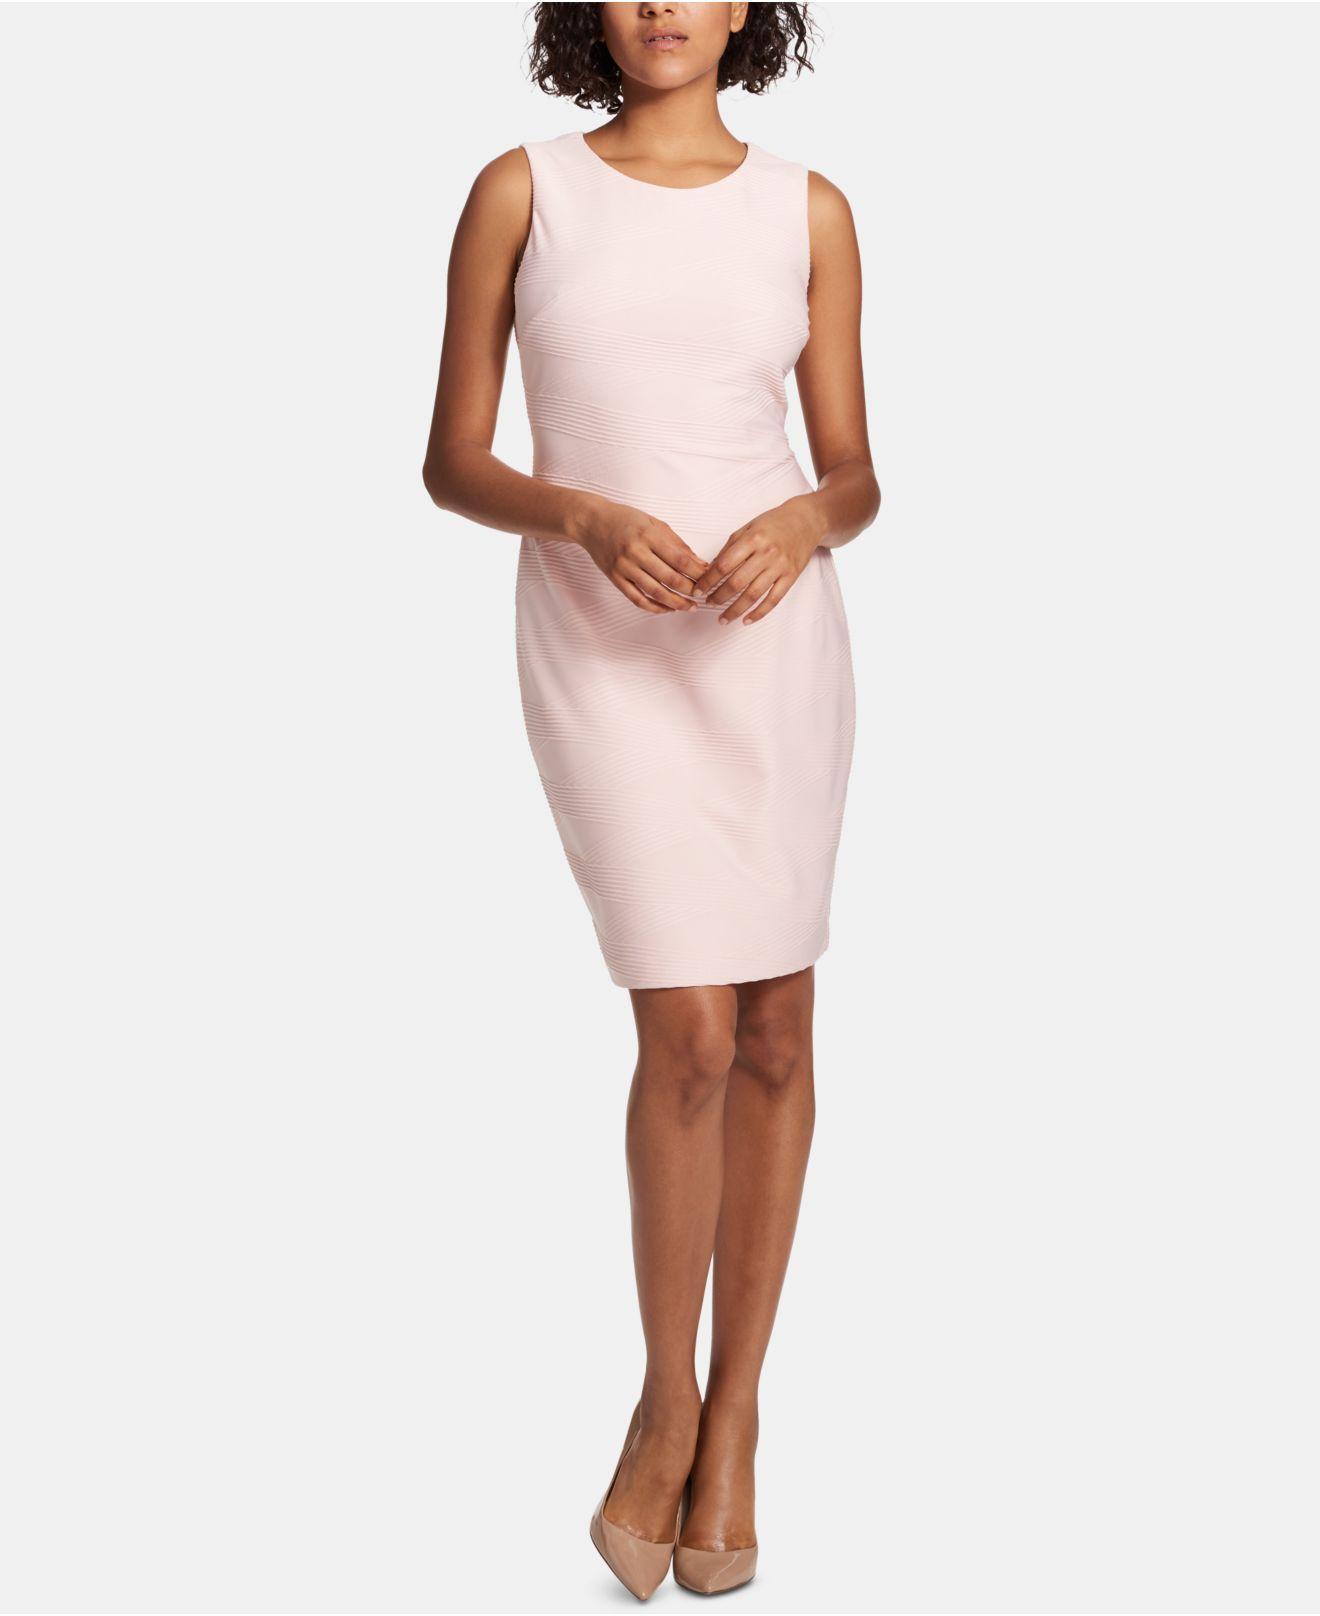 Tommy Hilfiger Women/'s Sleeveless Printed Texture Dress